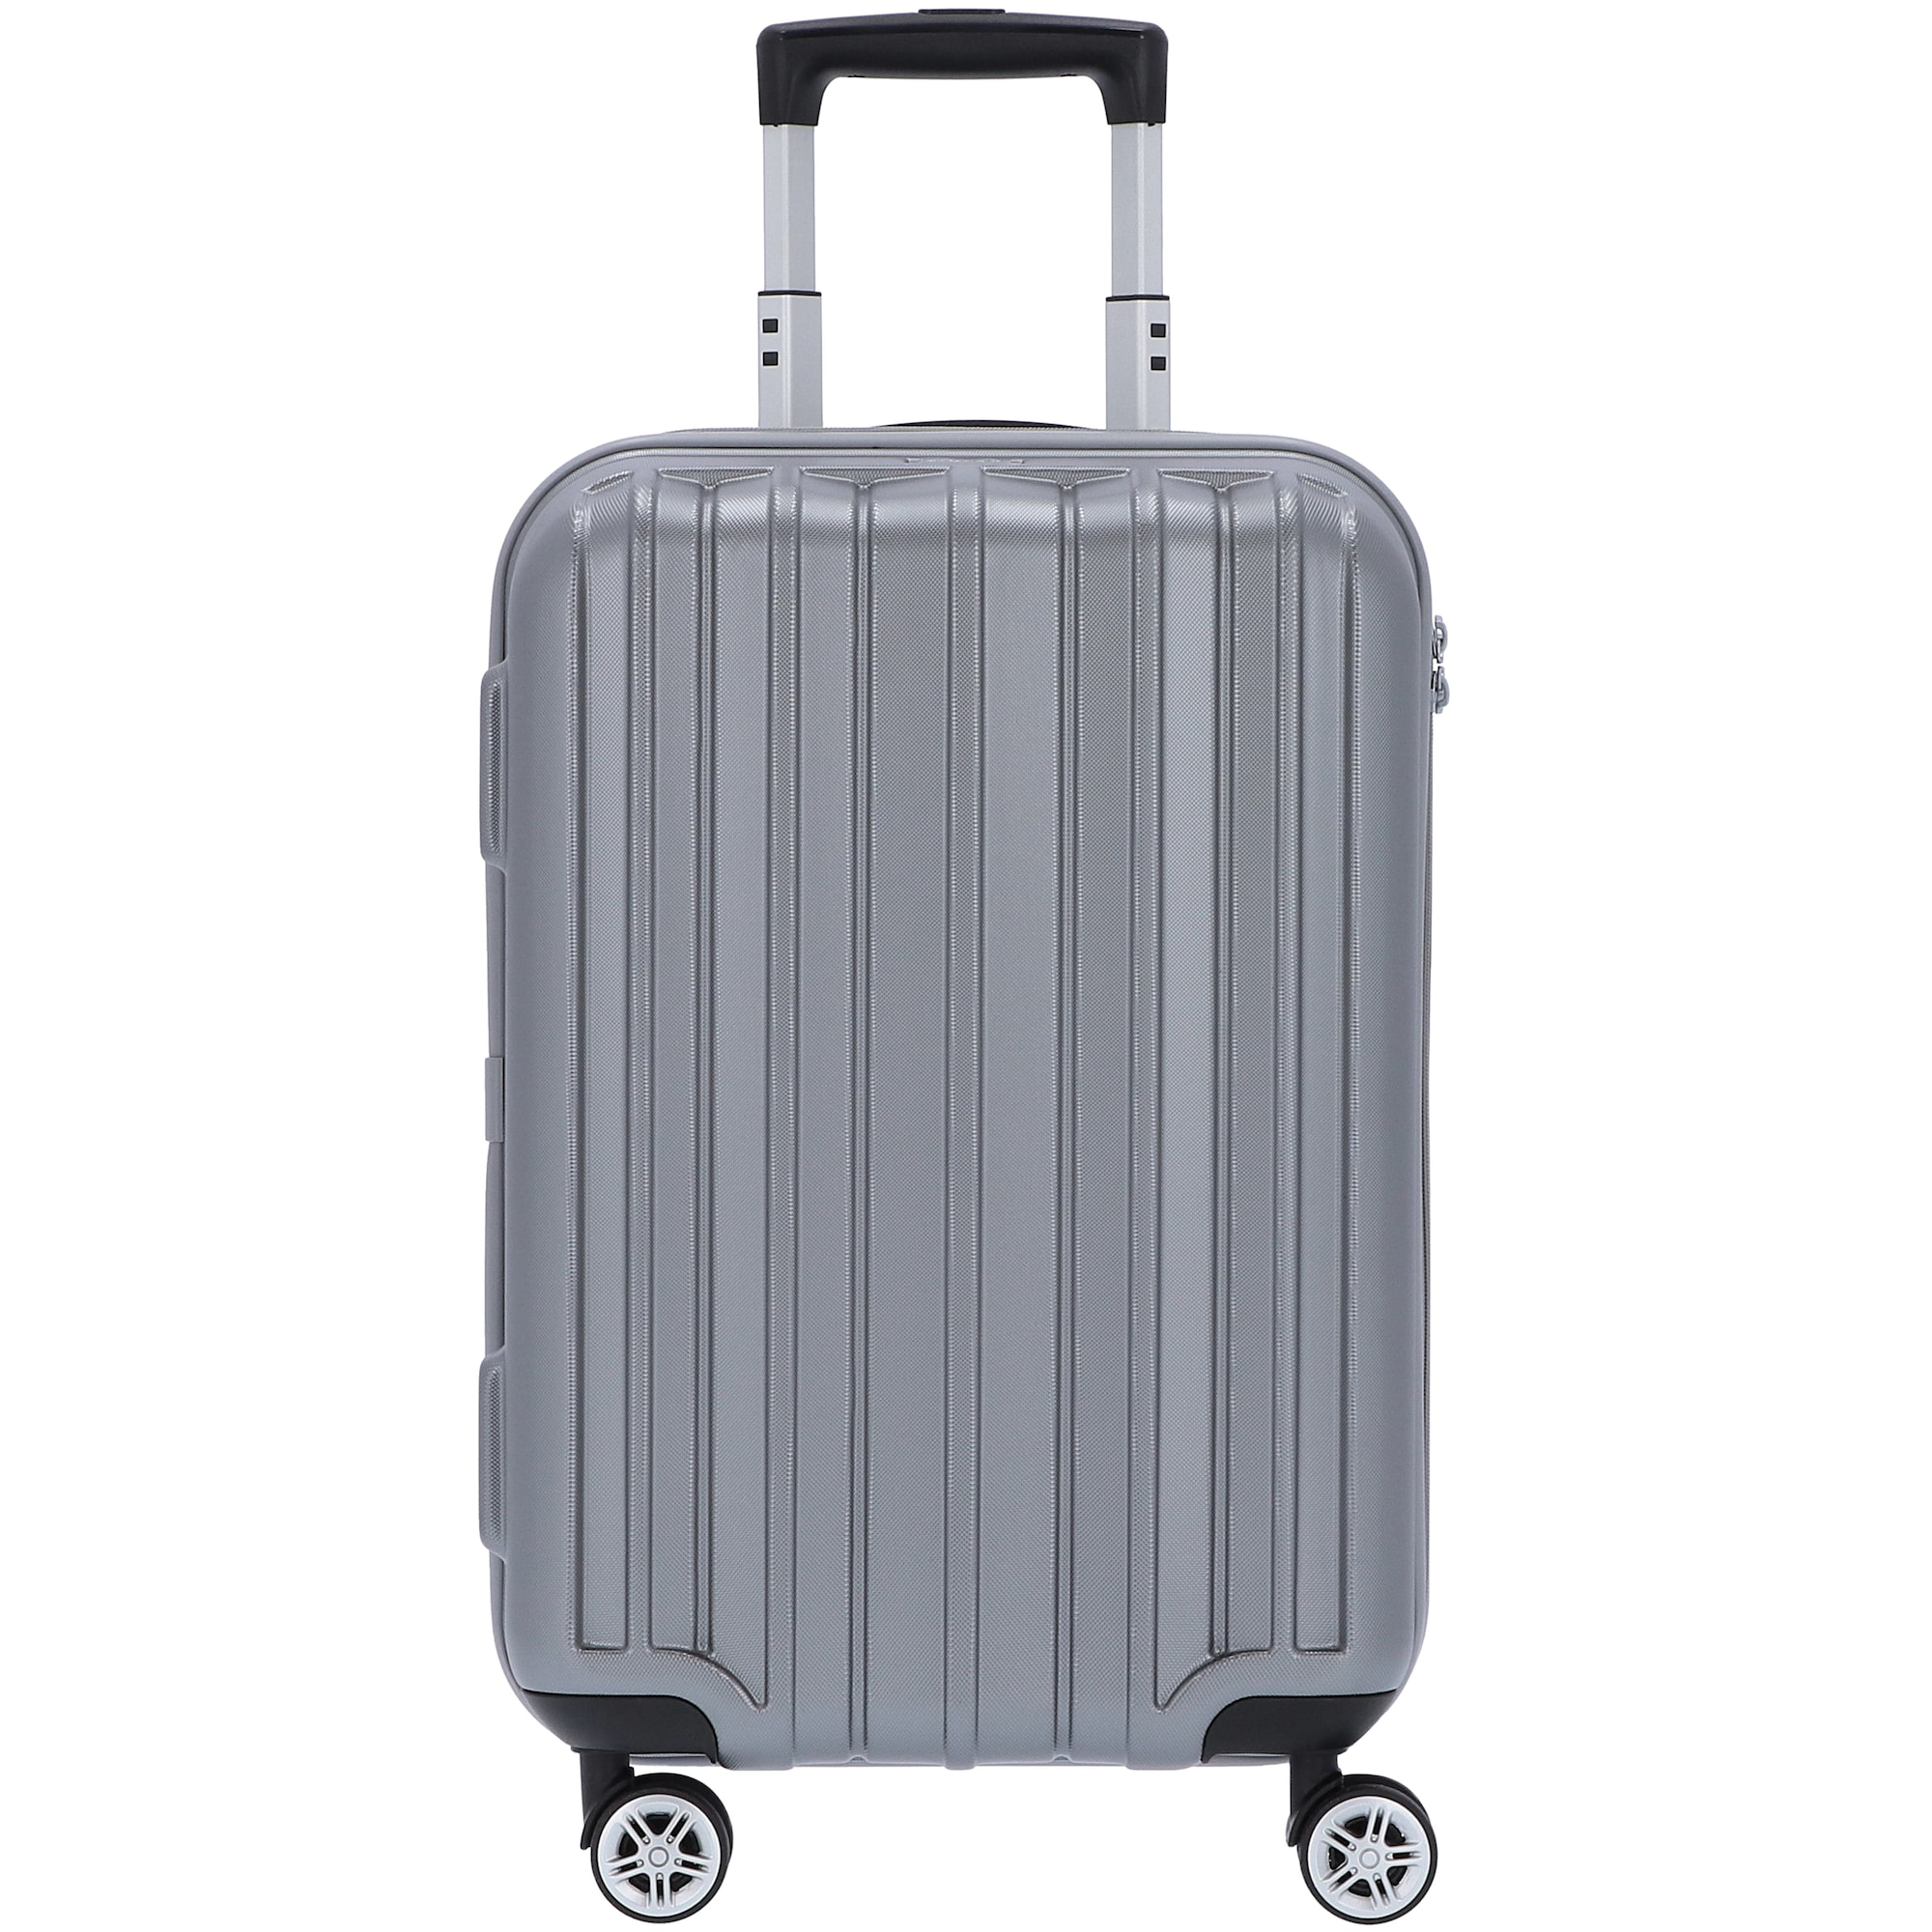 Trolley | Taschen > Koffer & Trolleys > Trolleys | Silber | Stratic